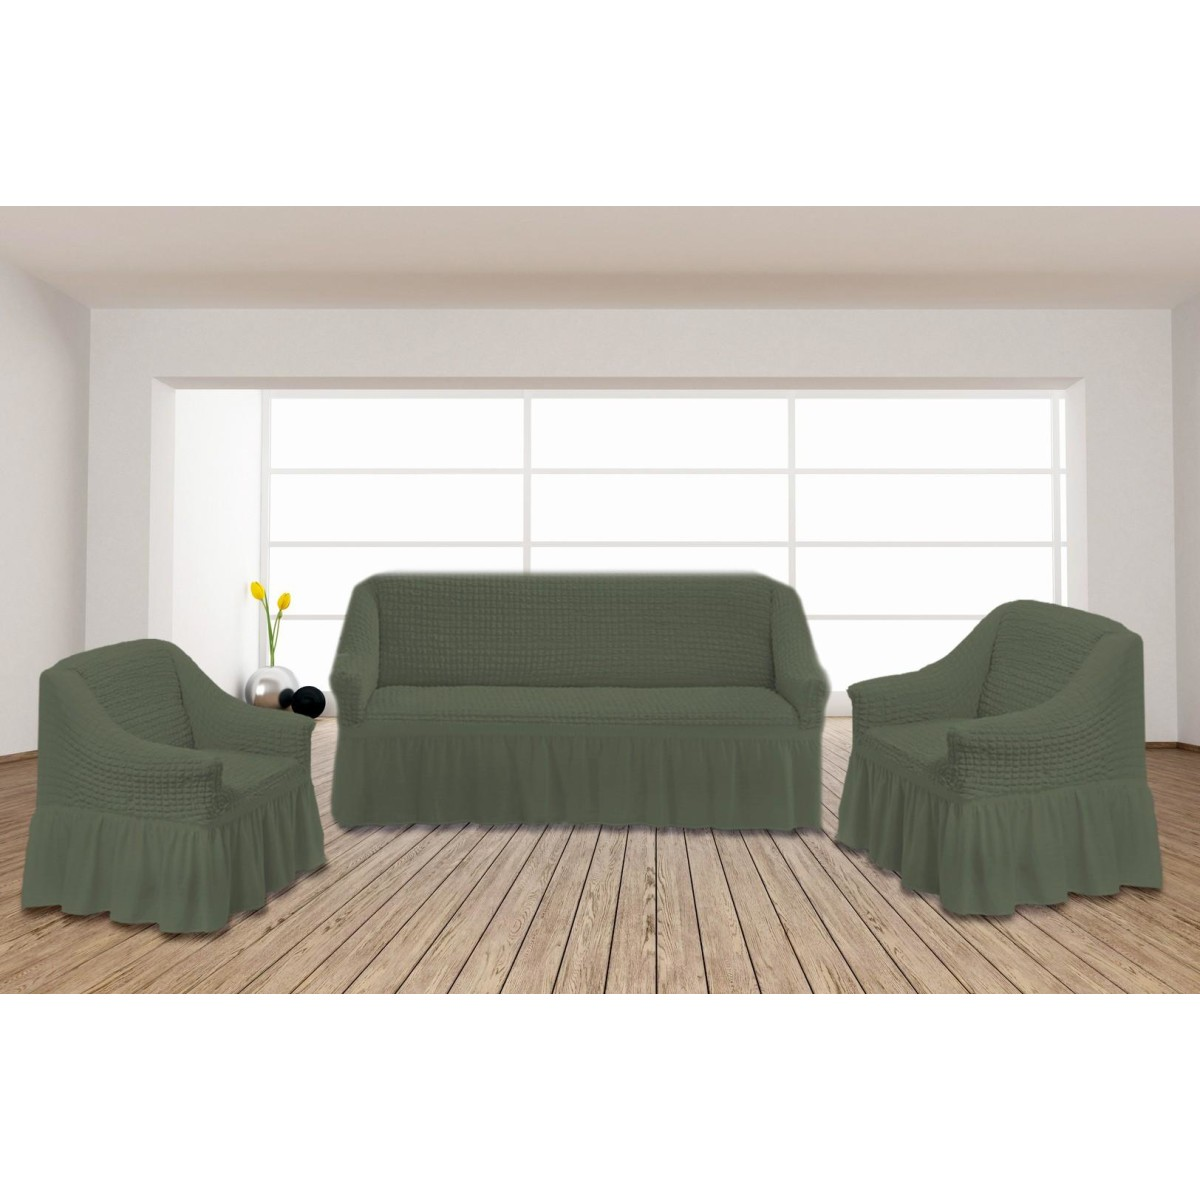 Комплект чехлов для мебели Texrepublic Absolute 8825